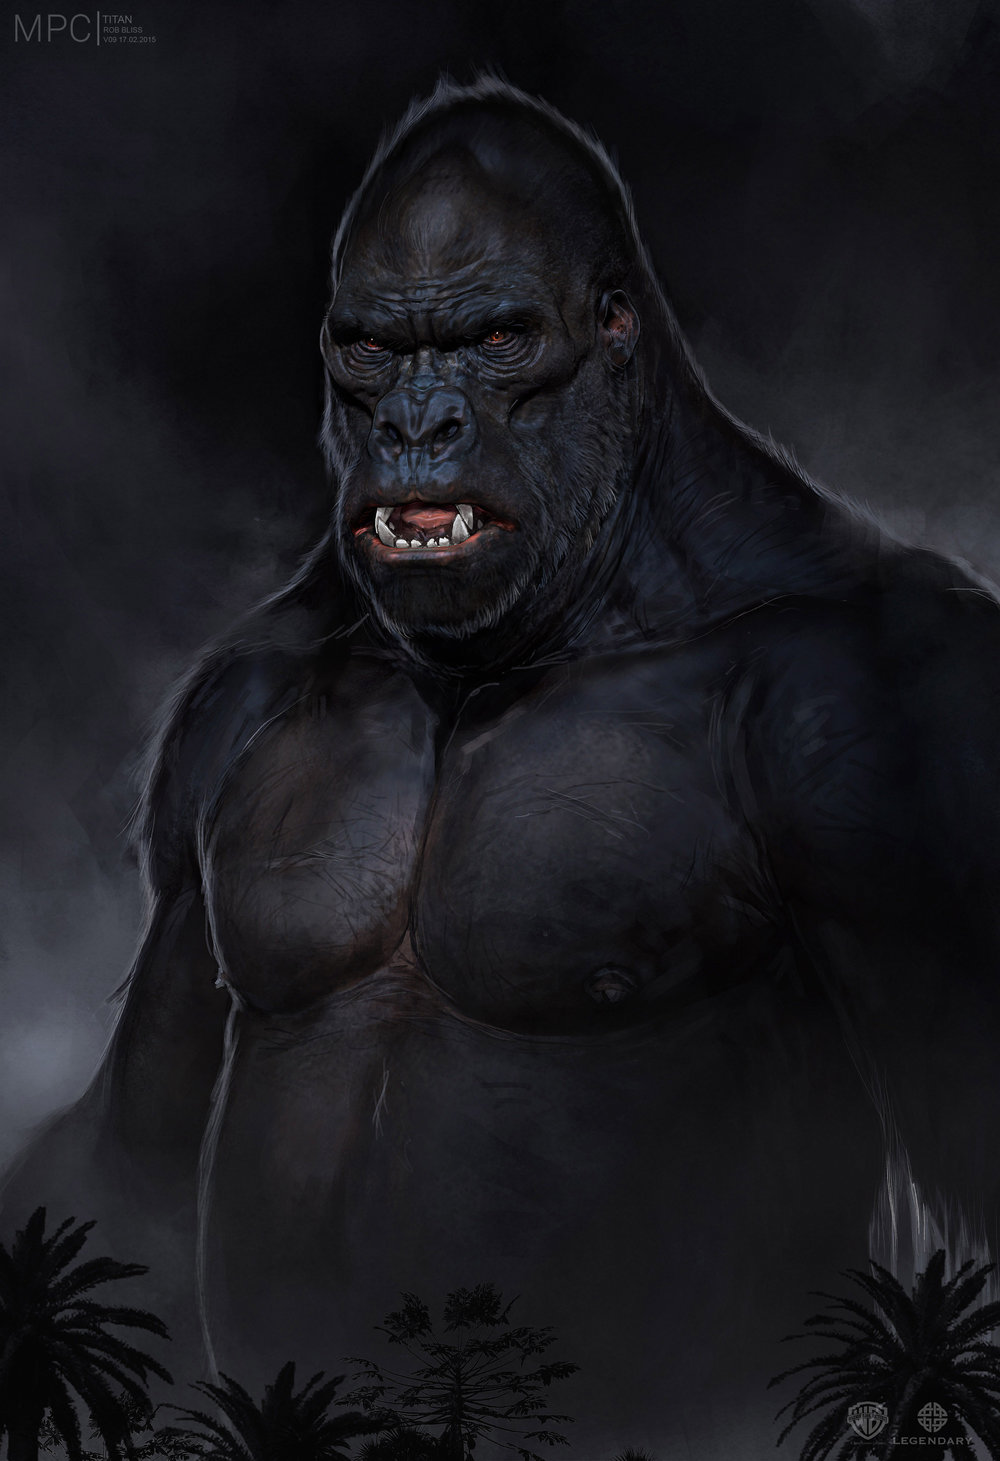 TITAN_Kong_RB01.1008.jpg